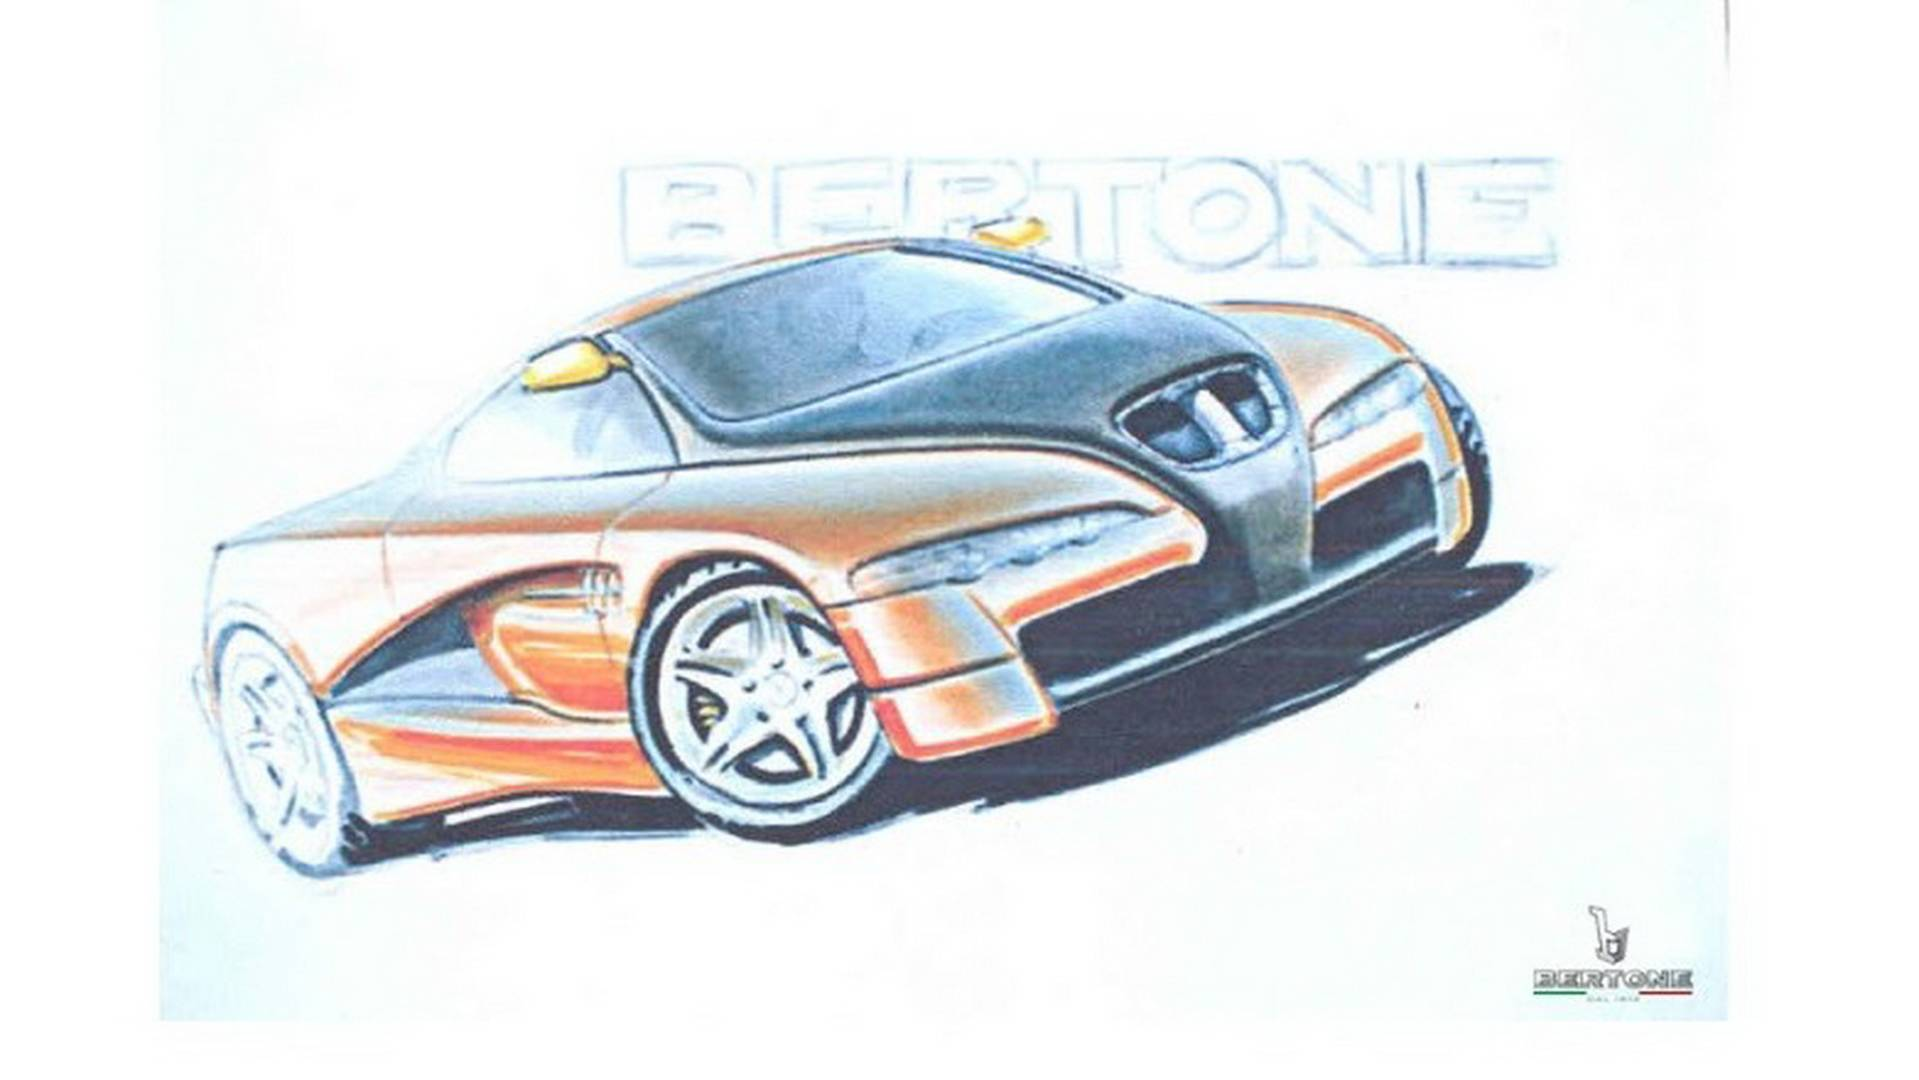 1998-bertone-bmw-pickster-concept14